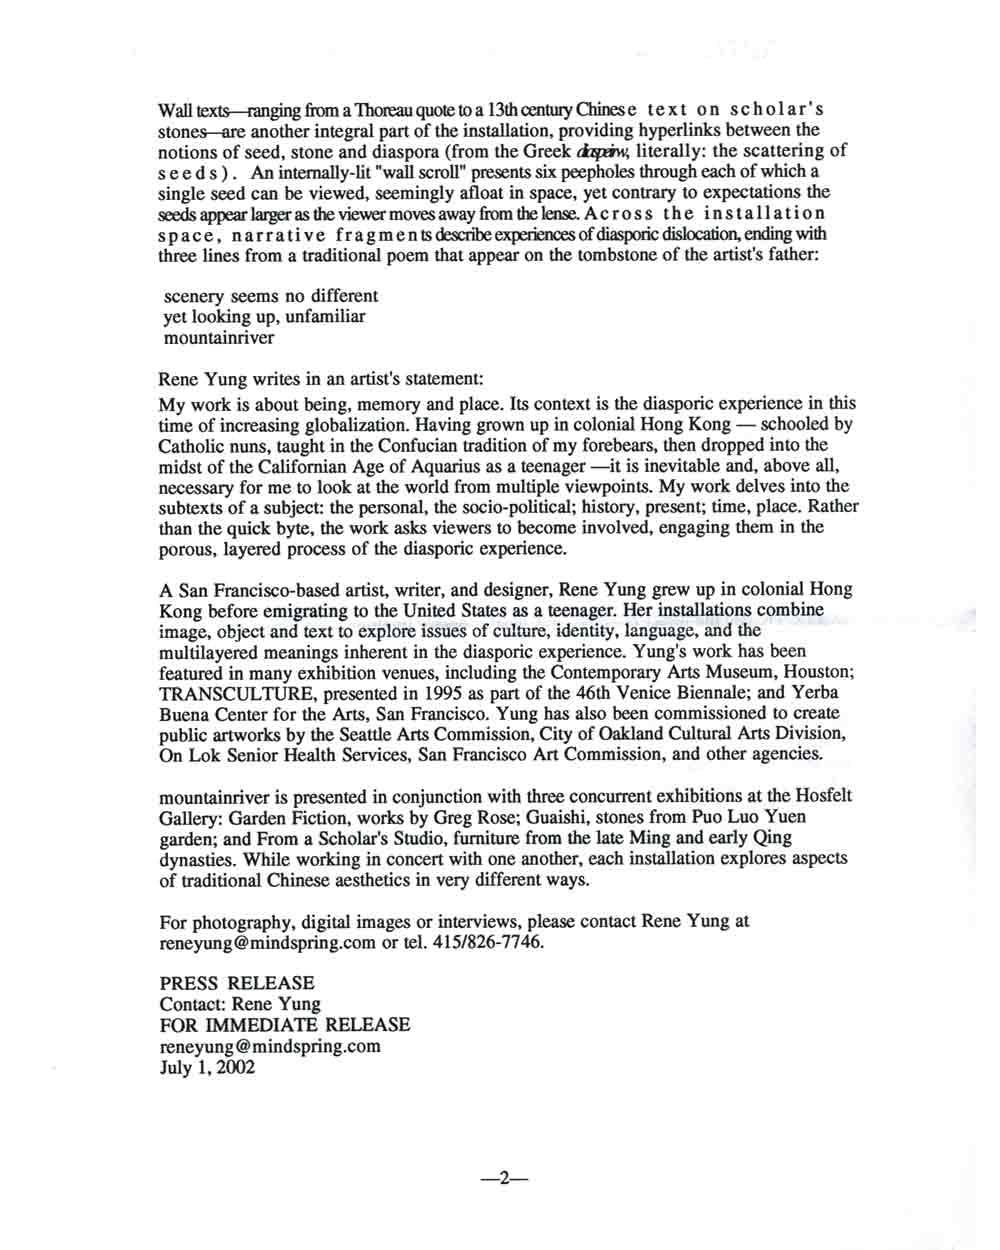 mountainriver, press release, pg 2